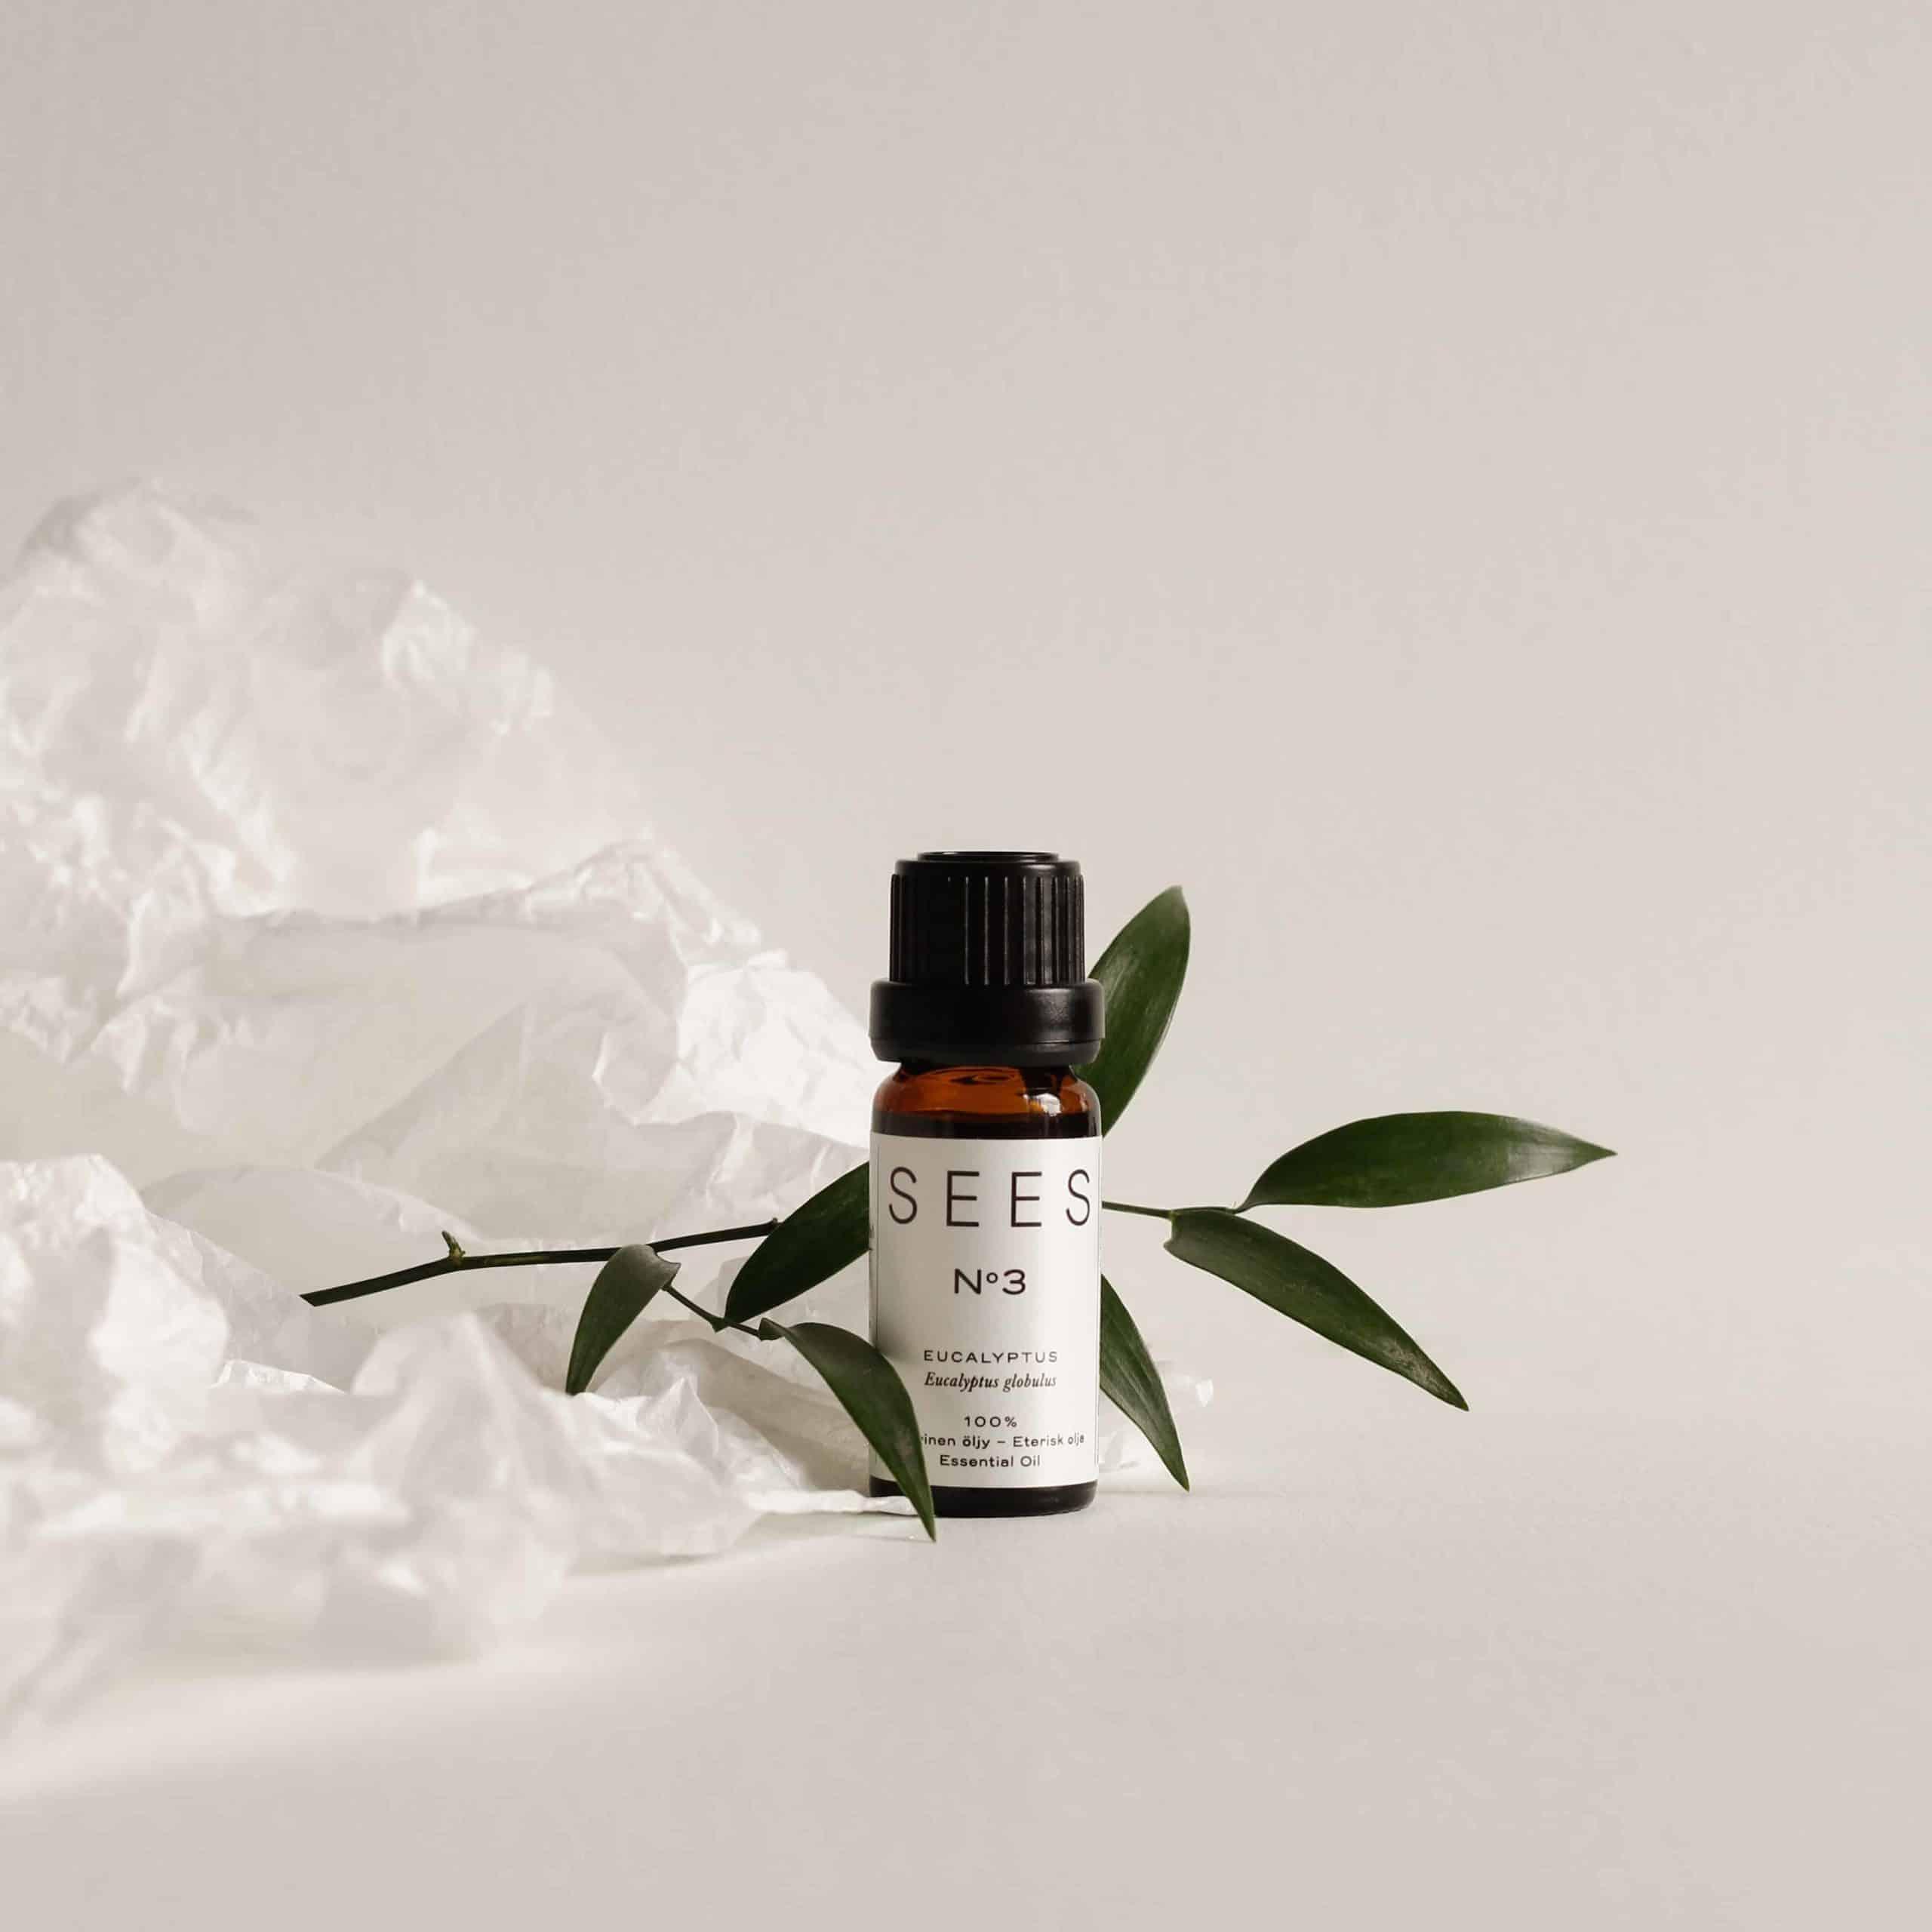 SEES Company eucalyptus eteerinen öljy